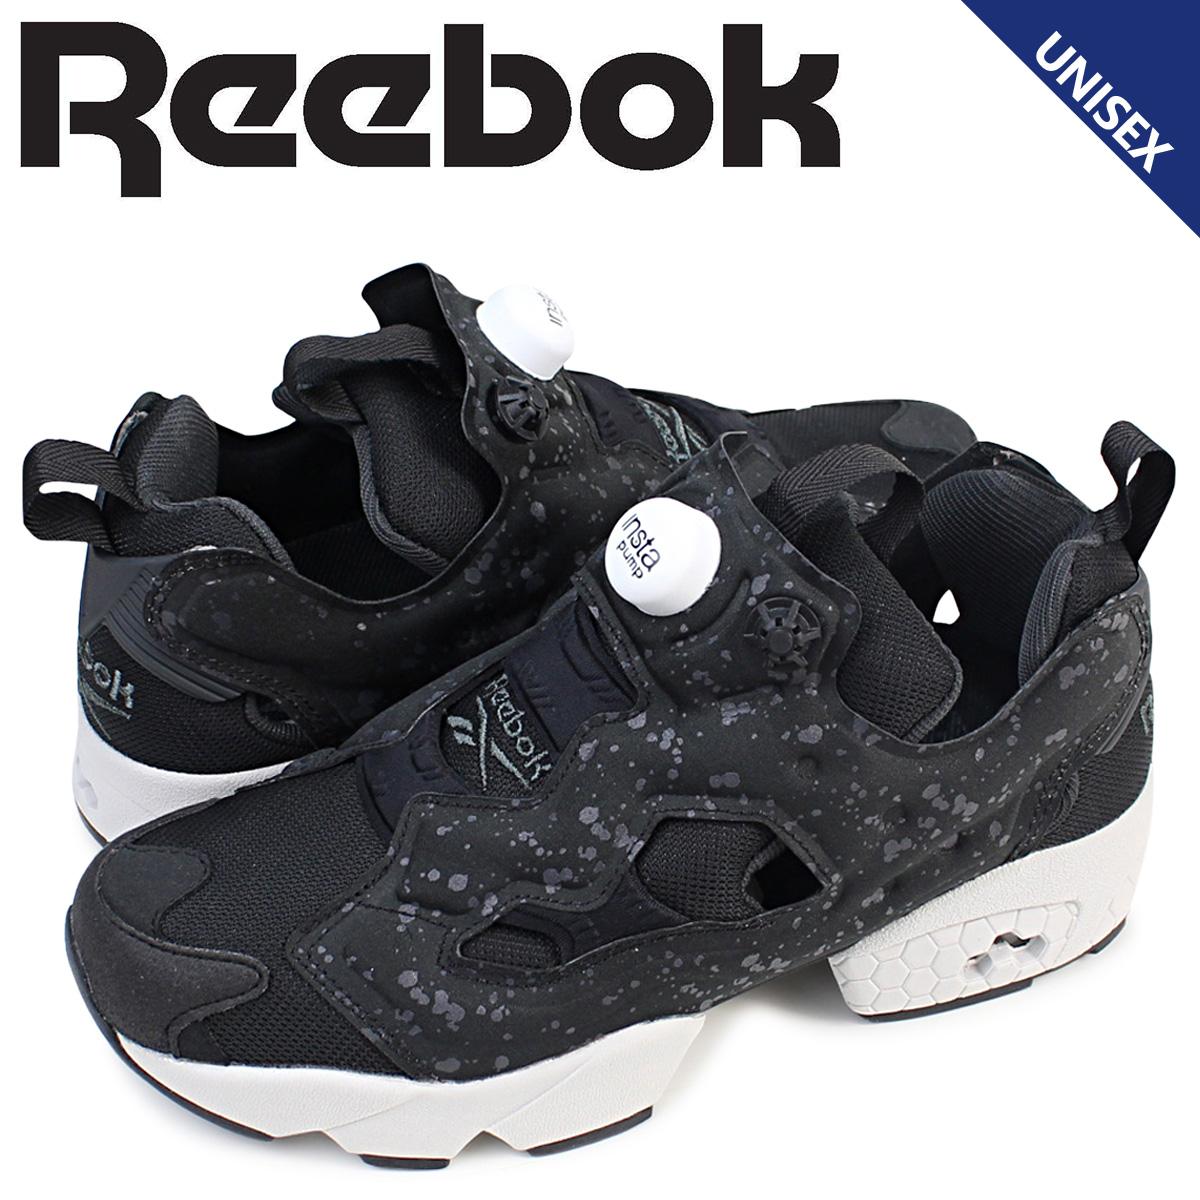 3f17d3f2bf27 Whats up Sports  Reebok Reebok pump fury sneakers INSTAPUMP FURY SP ...